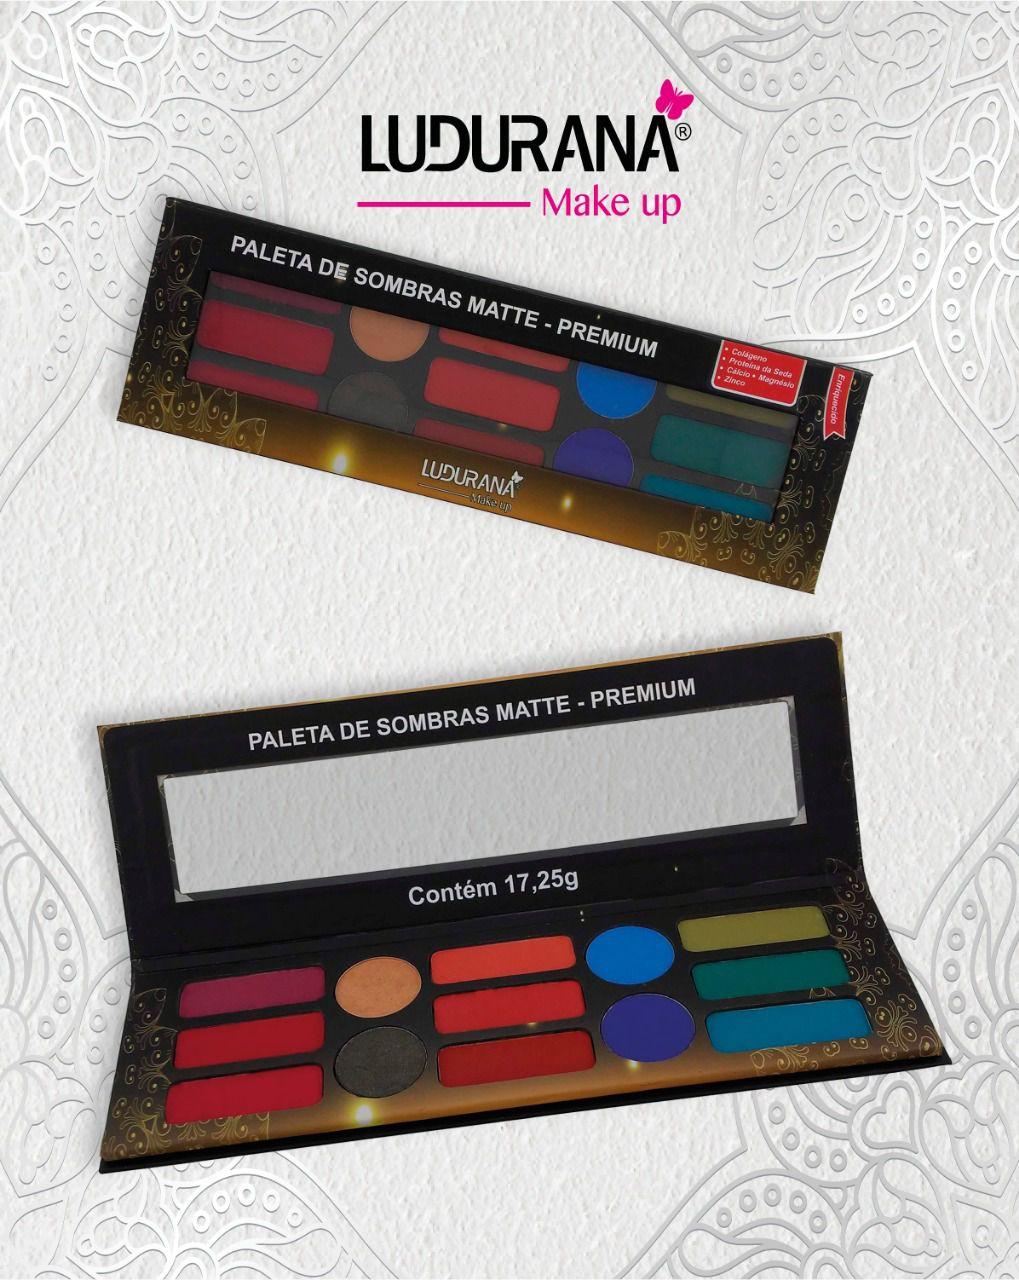 Paleta de sombra premium Ludurana